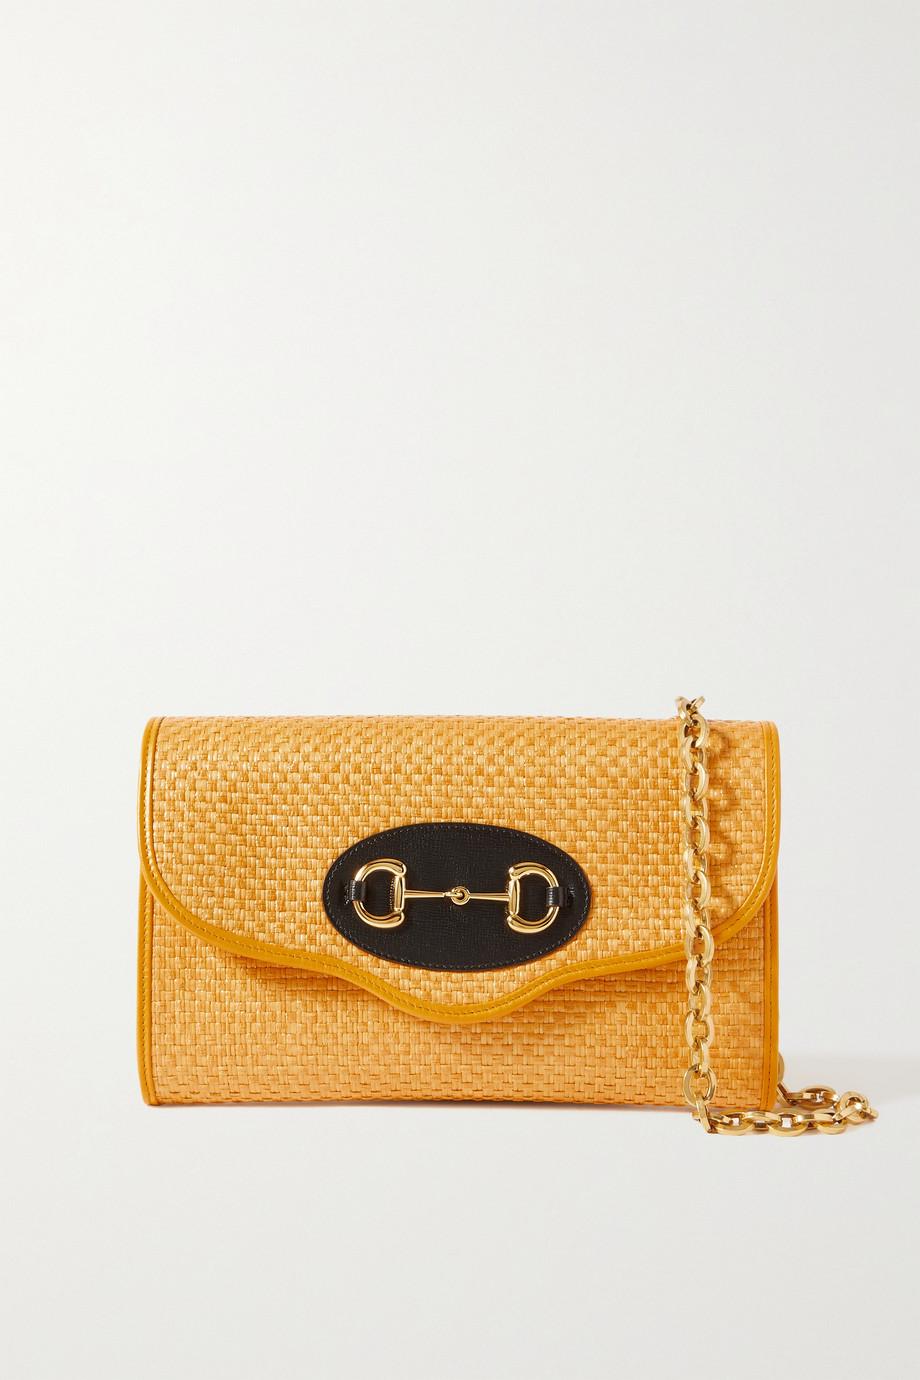 Gucci Horsebit 1955 leather-trimmed faux straw shoulder bag